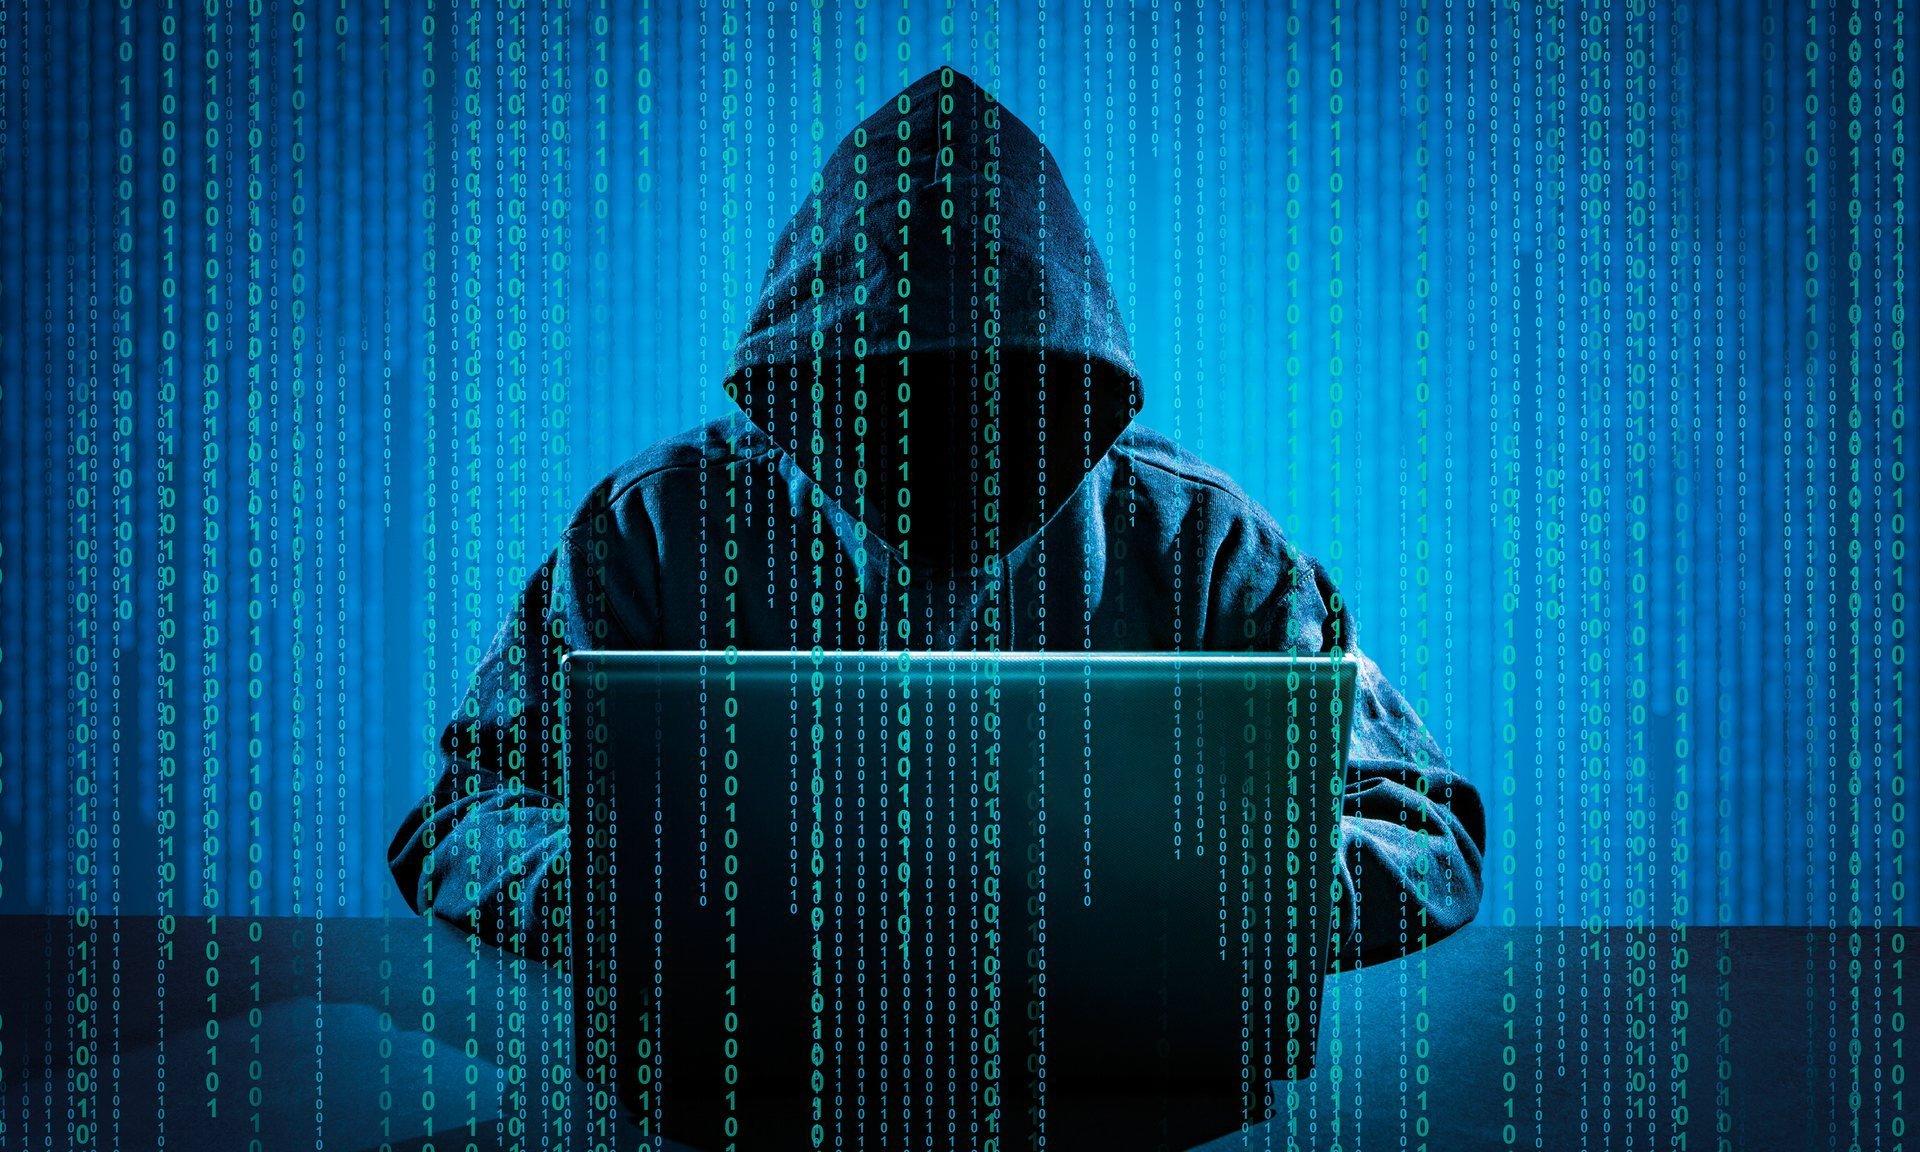 Фото на аву для хакера